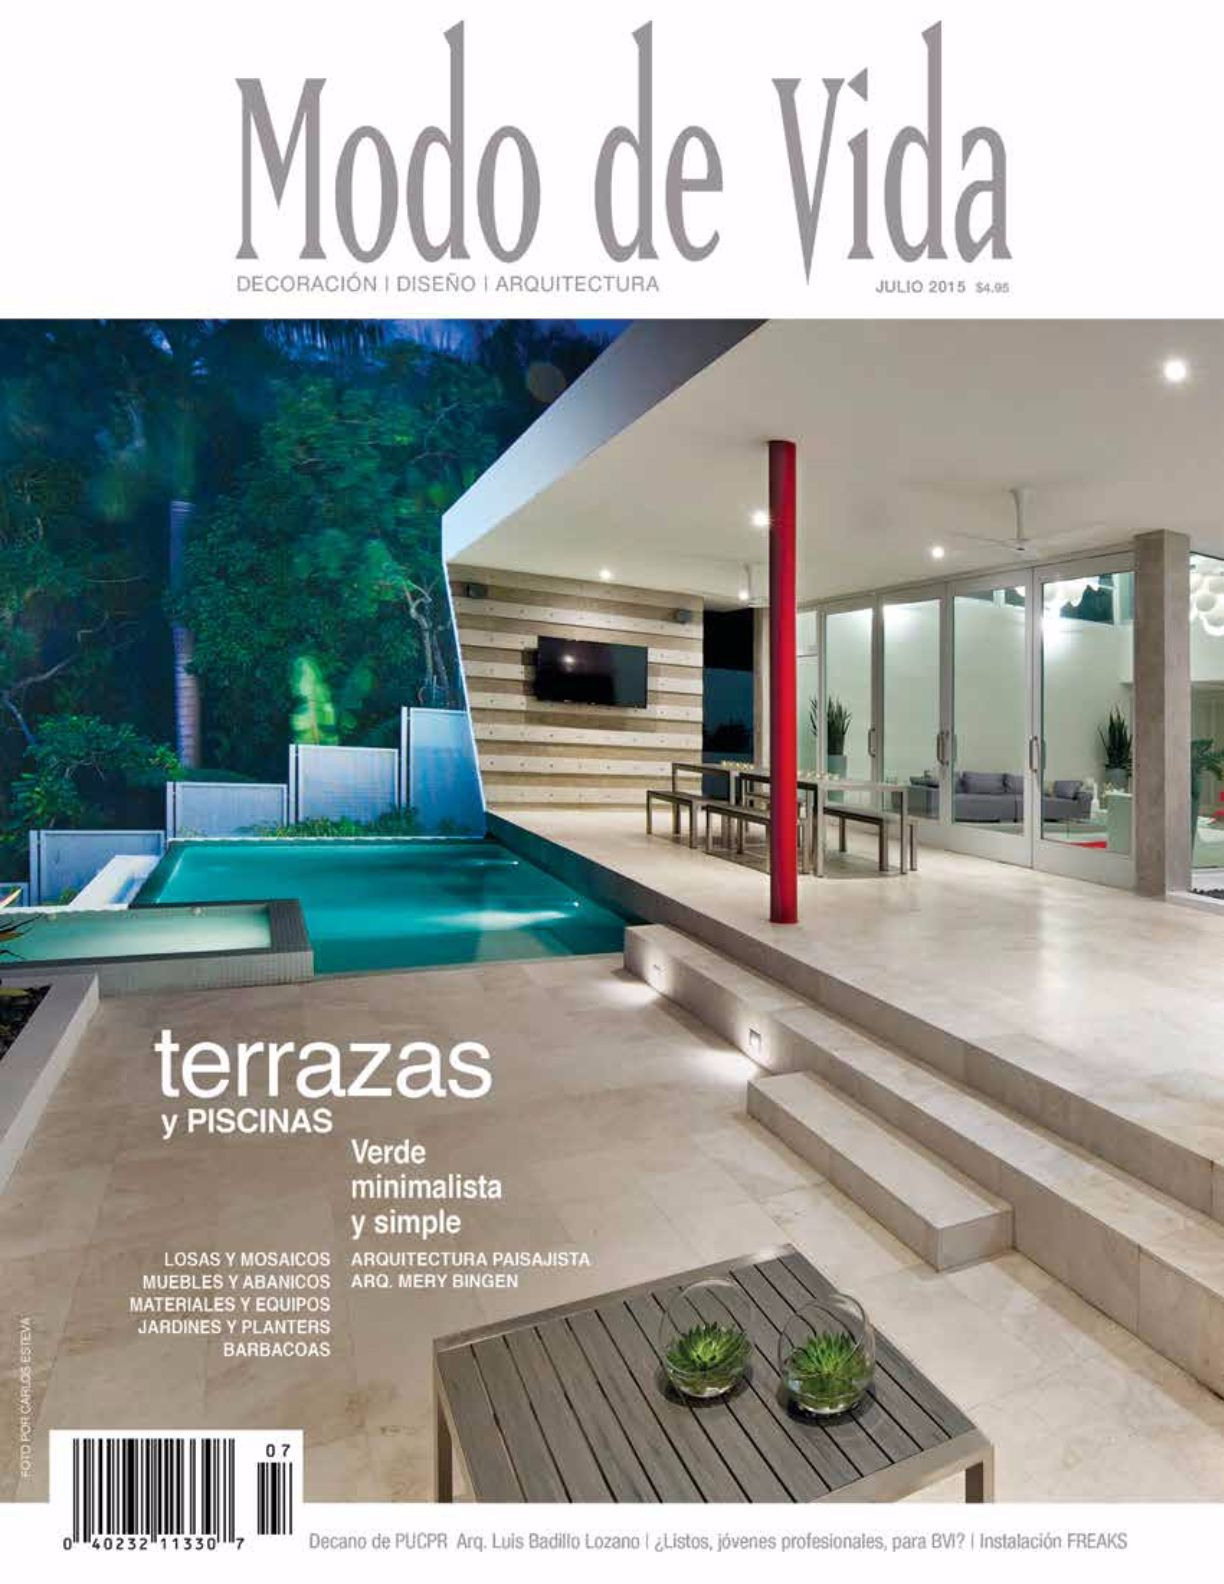 Revista modo de vida dise o decoraci n edicioines - Libros de decoracion de interiores gratis ...